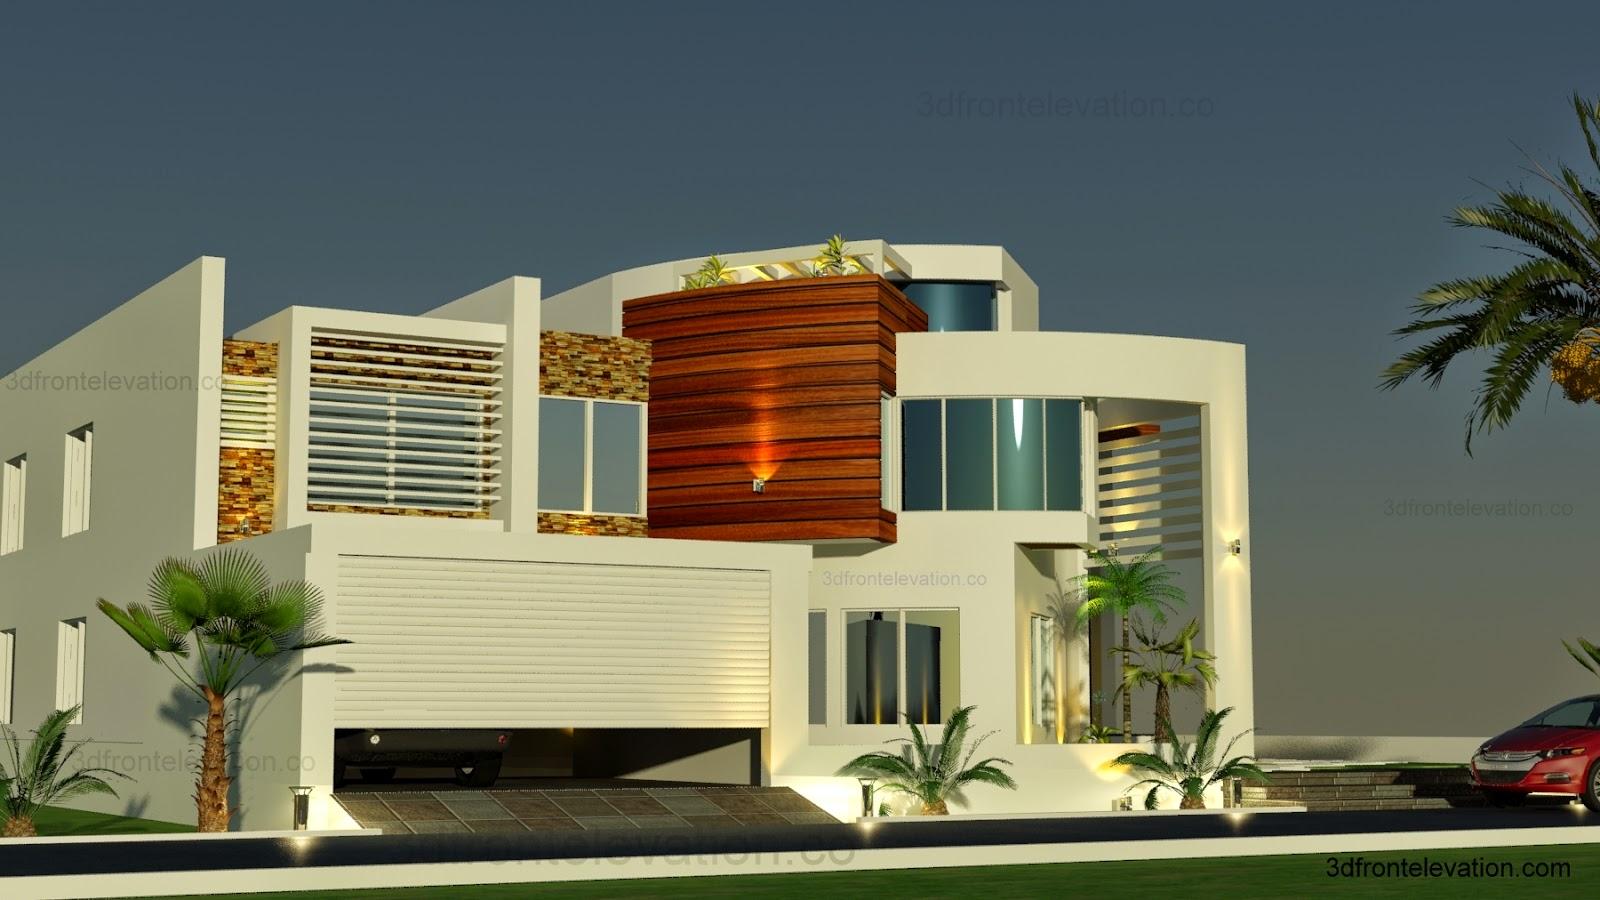 3D Front Elevation.com: Oman Modern Contemporary Villa 3D